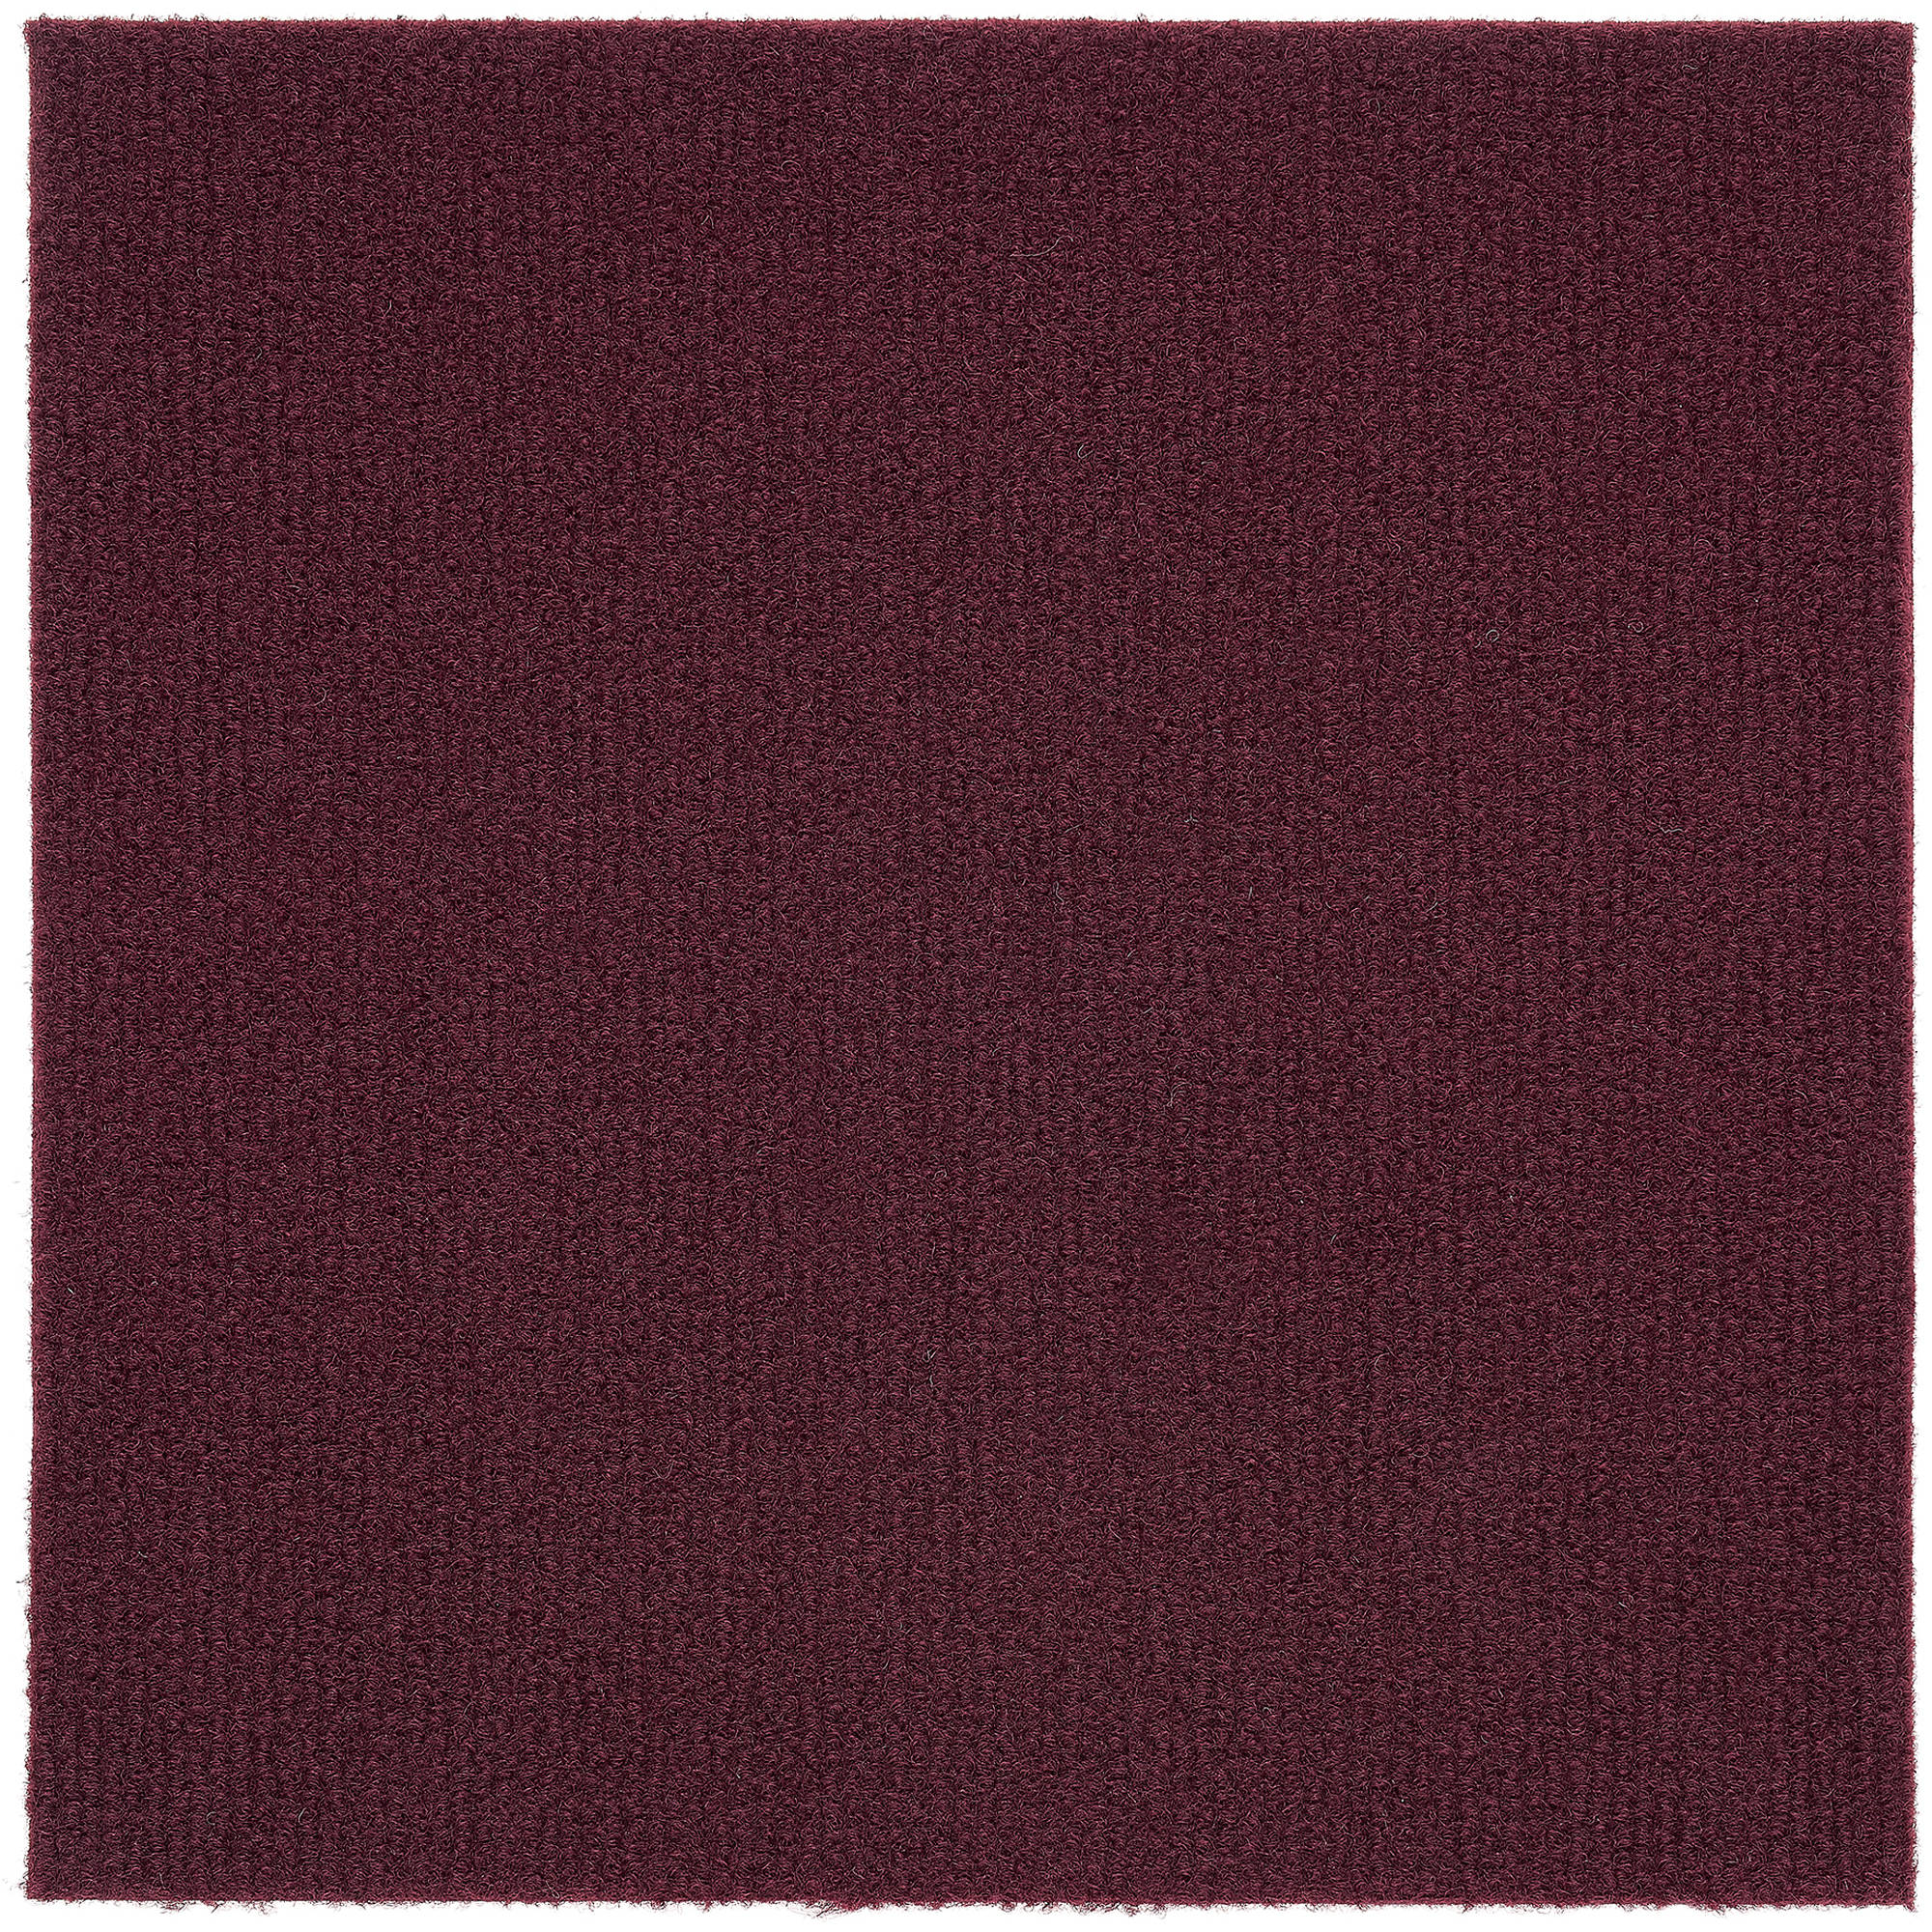 Flooring walmart nexus 12x12 self adhesive carpet floor tile 12 tiles12 sq ft dailygadgetfo Gallery